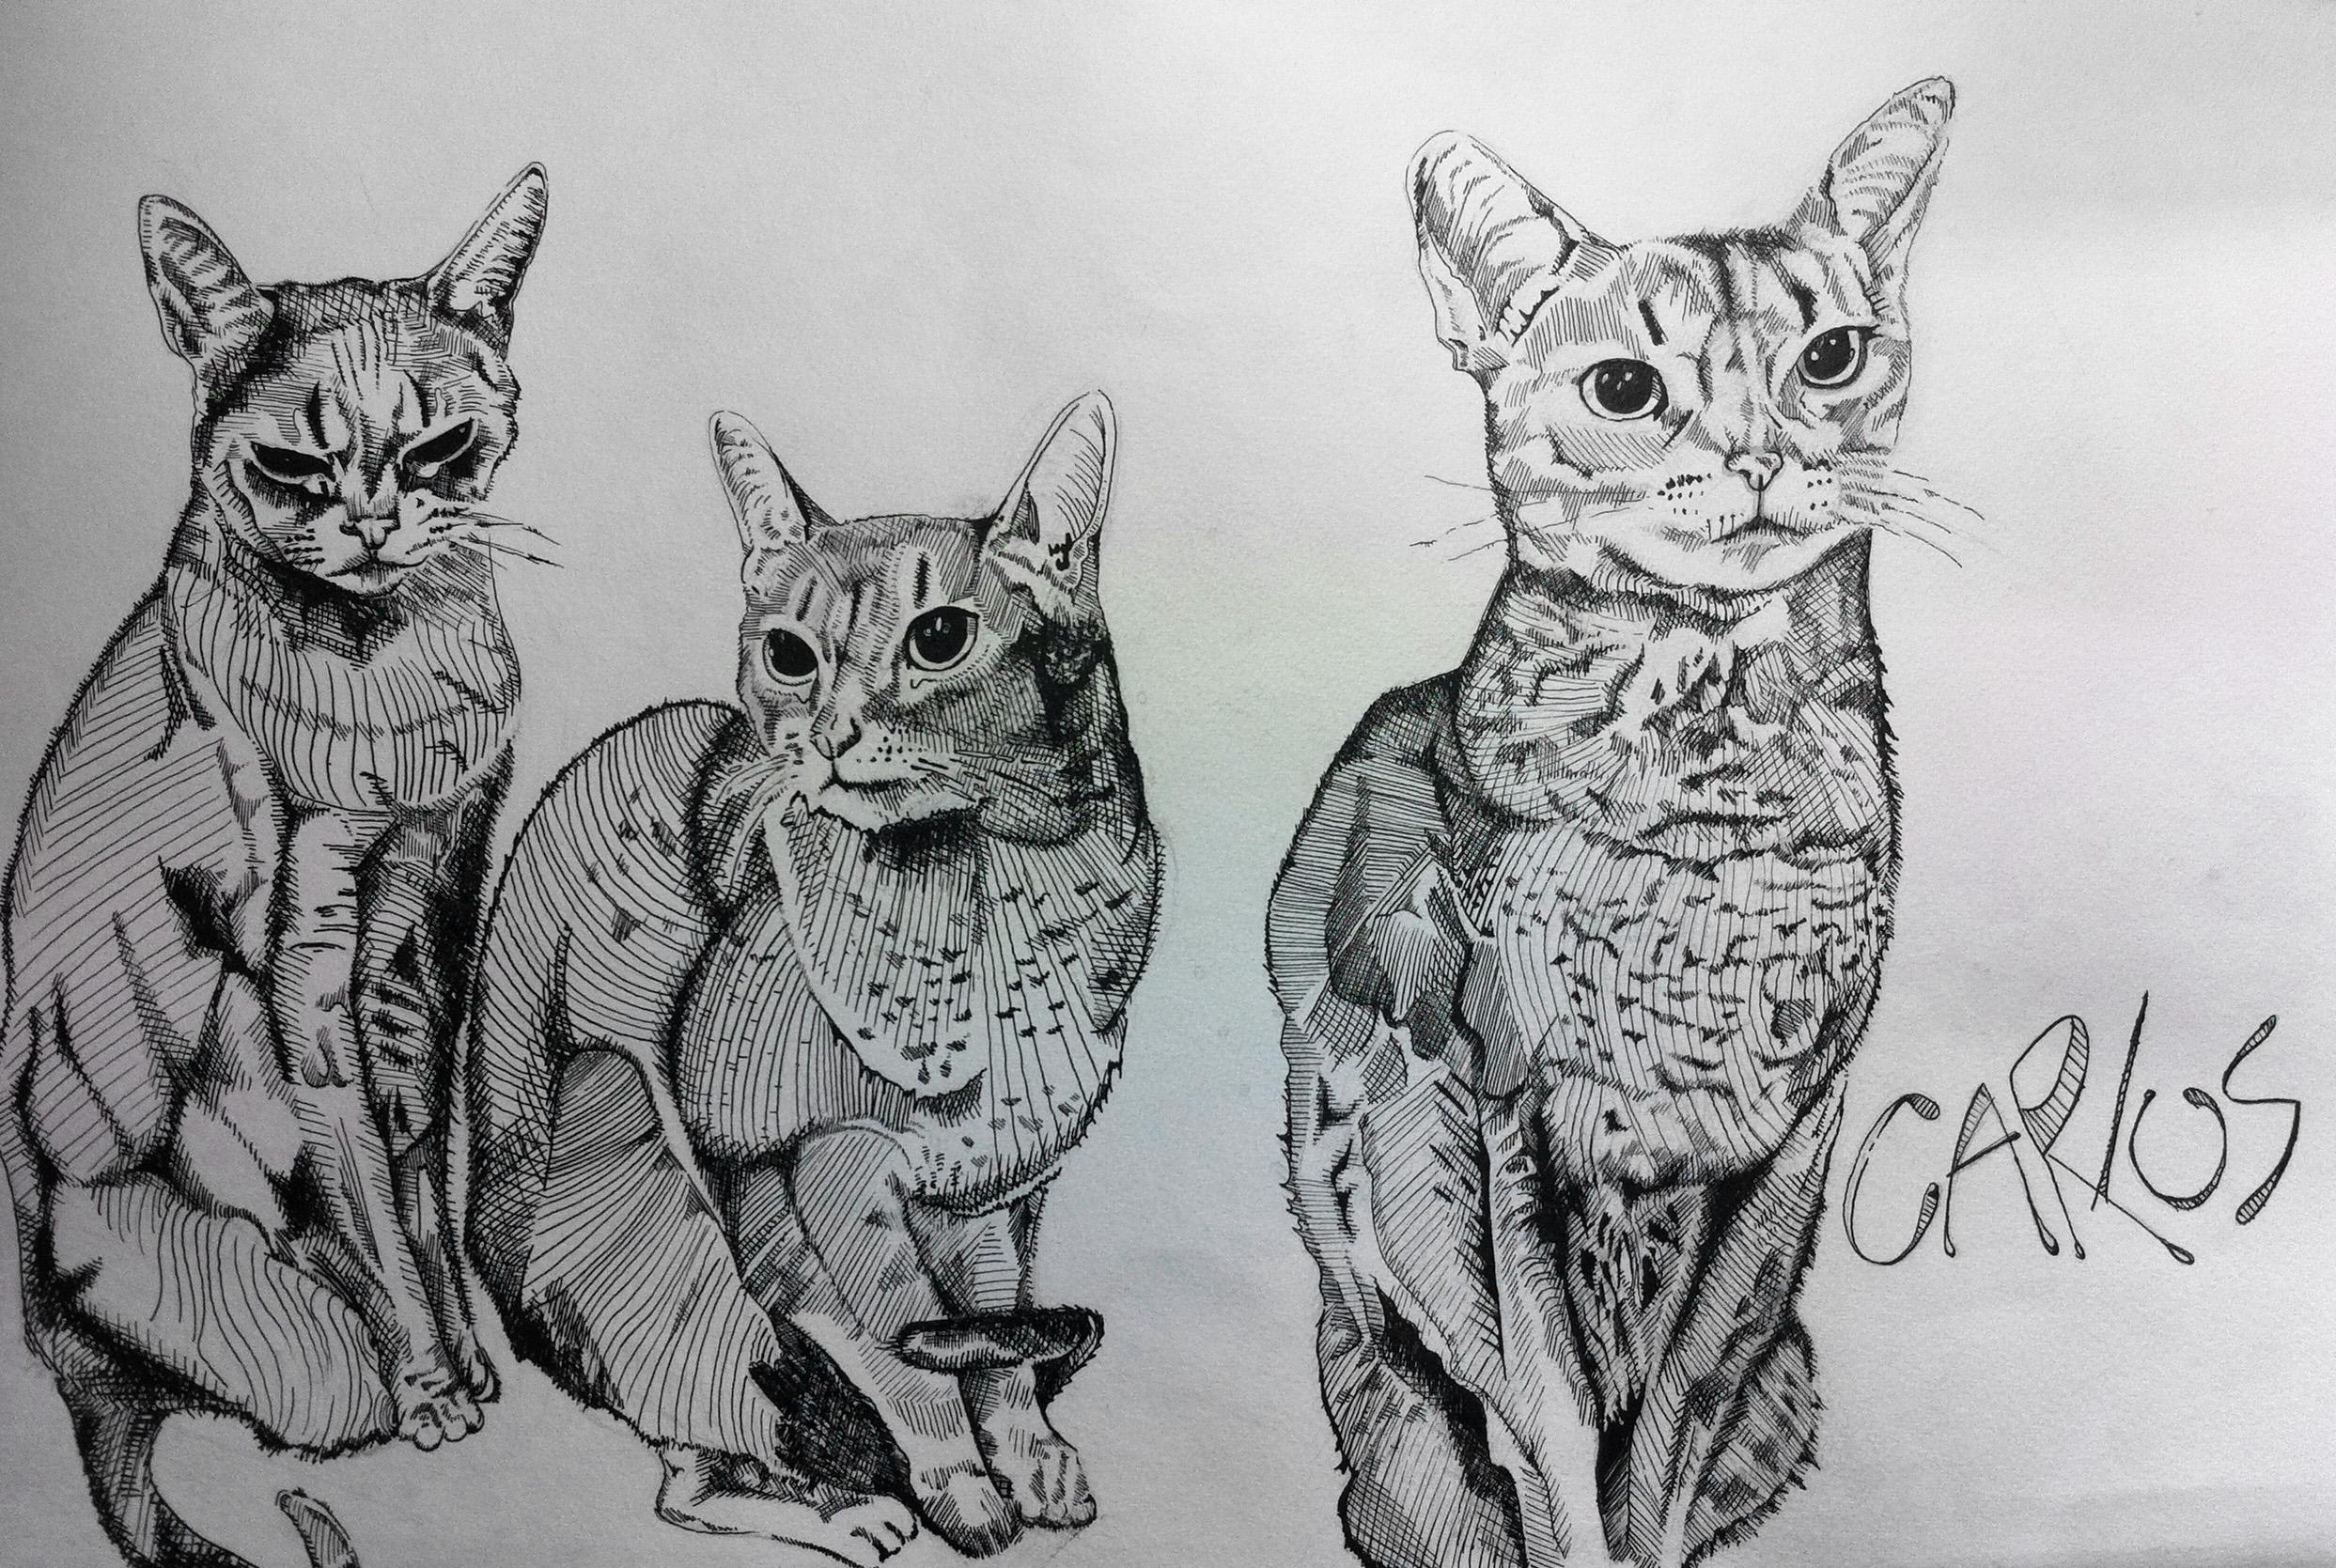 Gatos copy.jpg